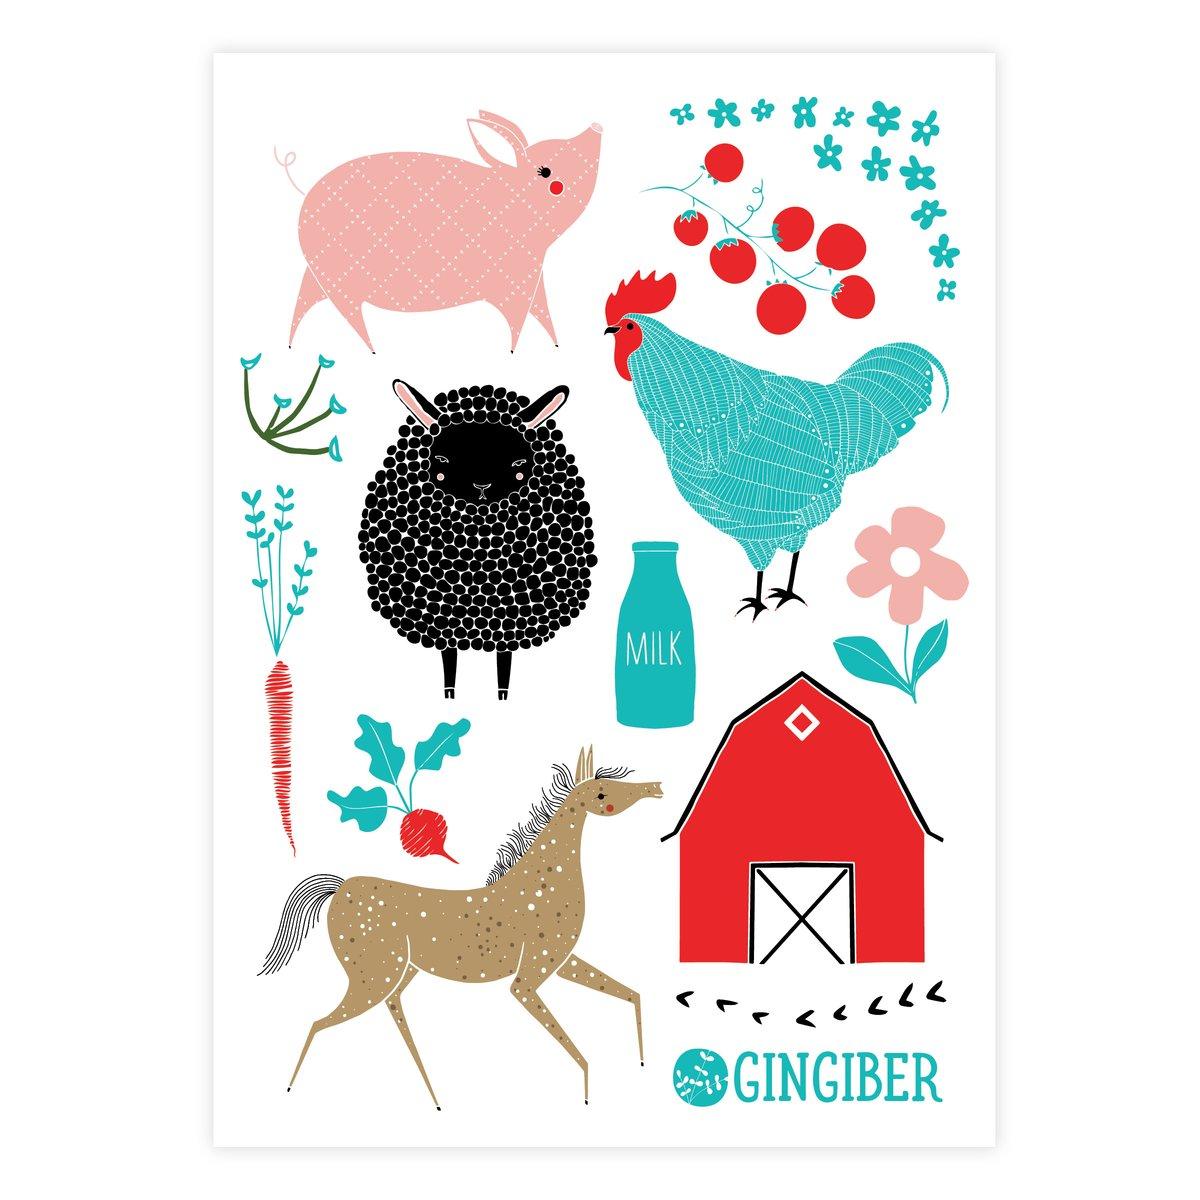 Farm Charm Sticker Sheet